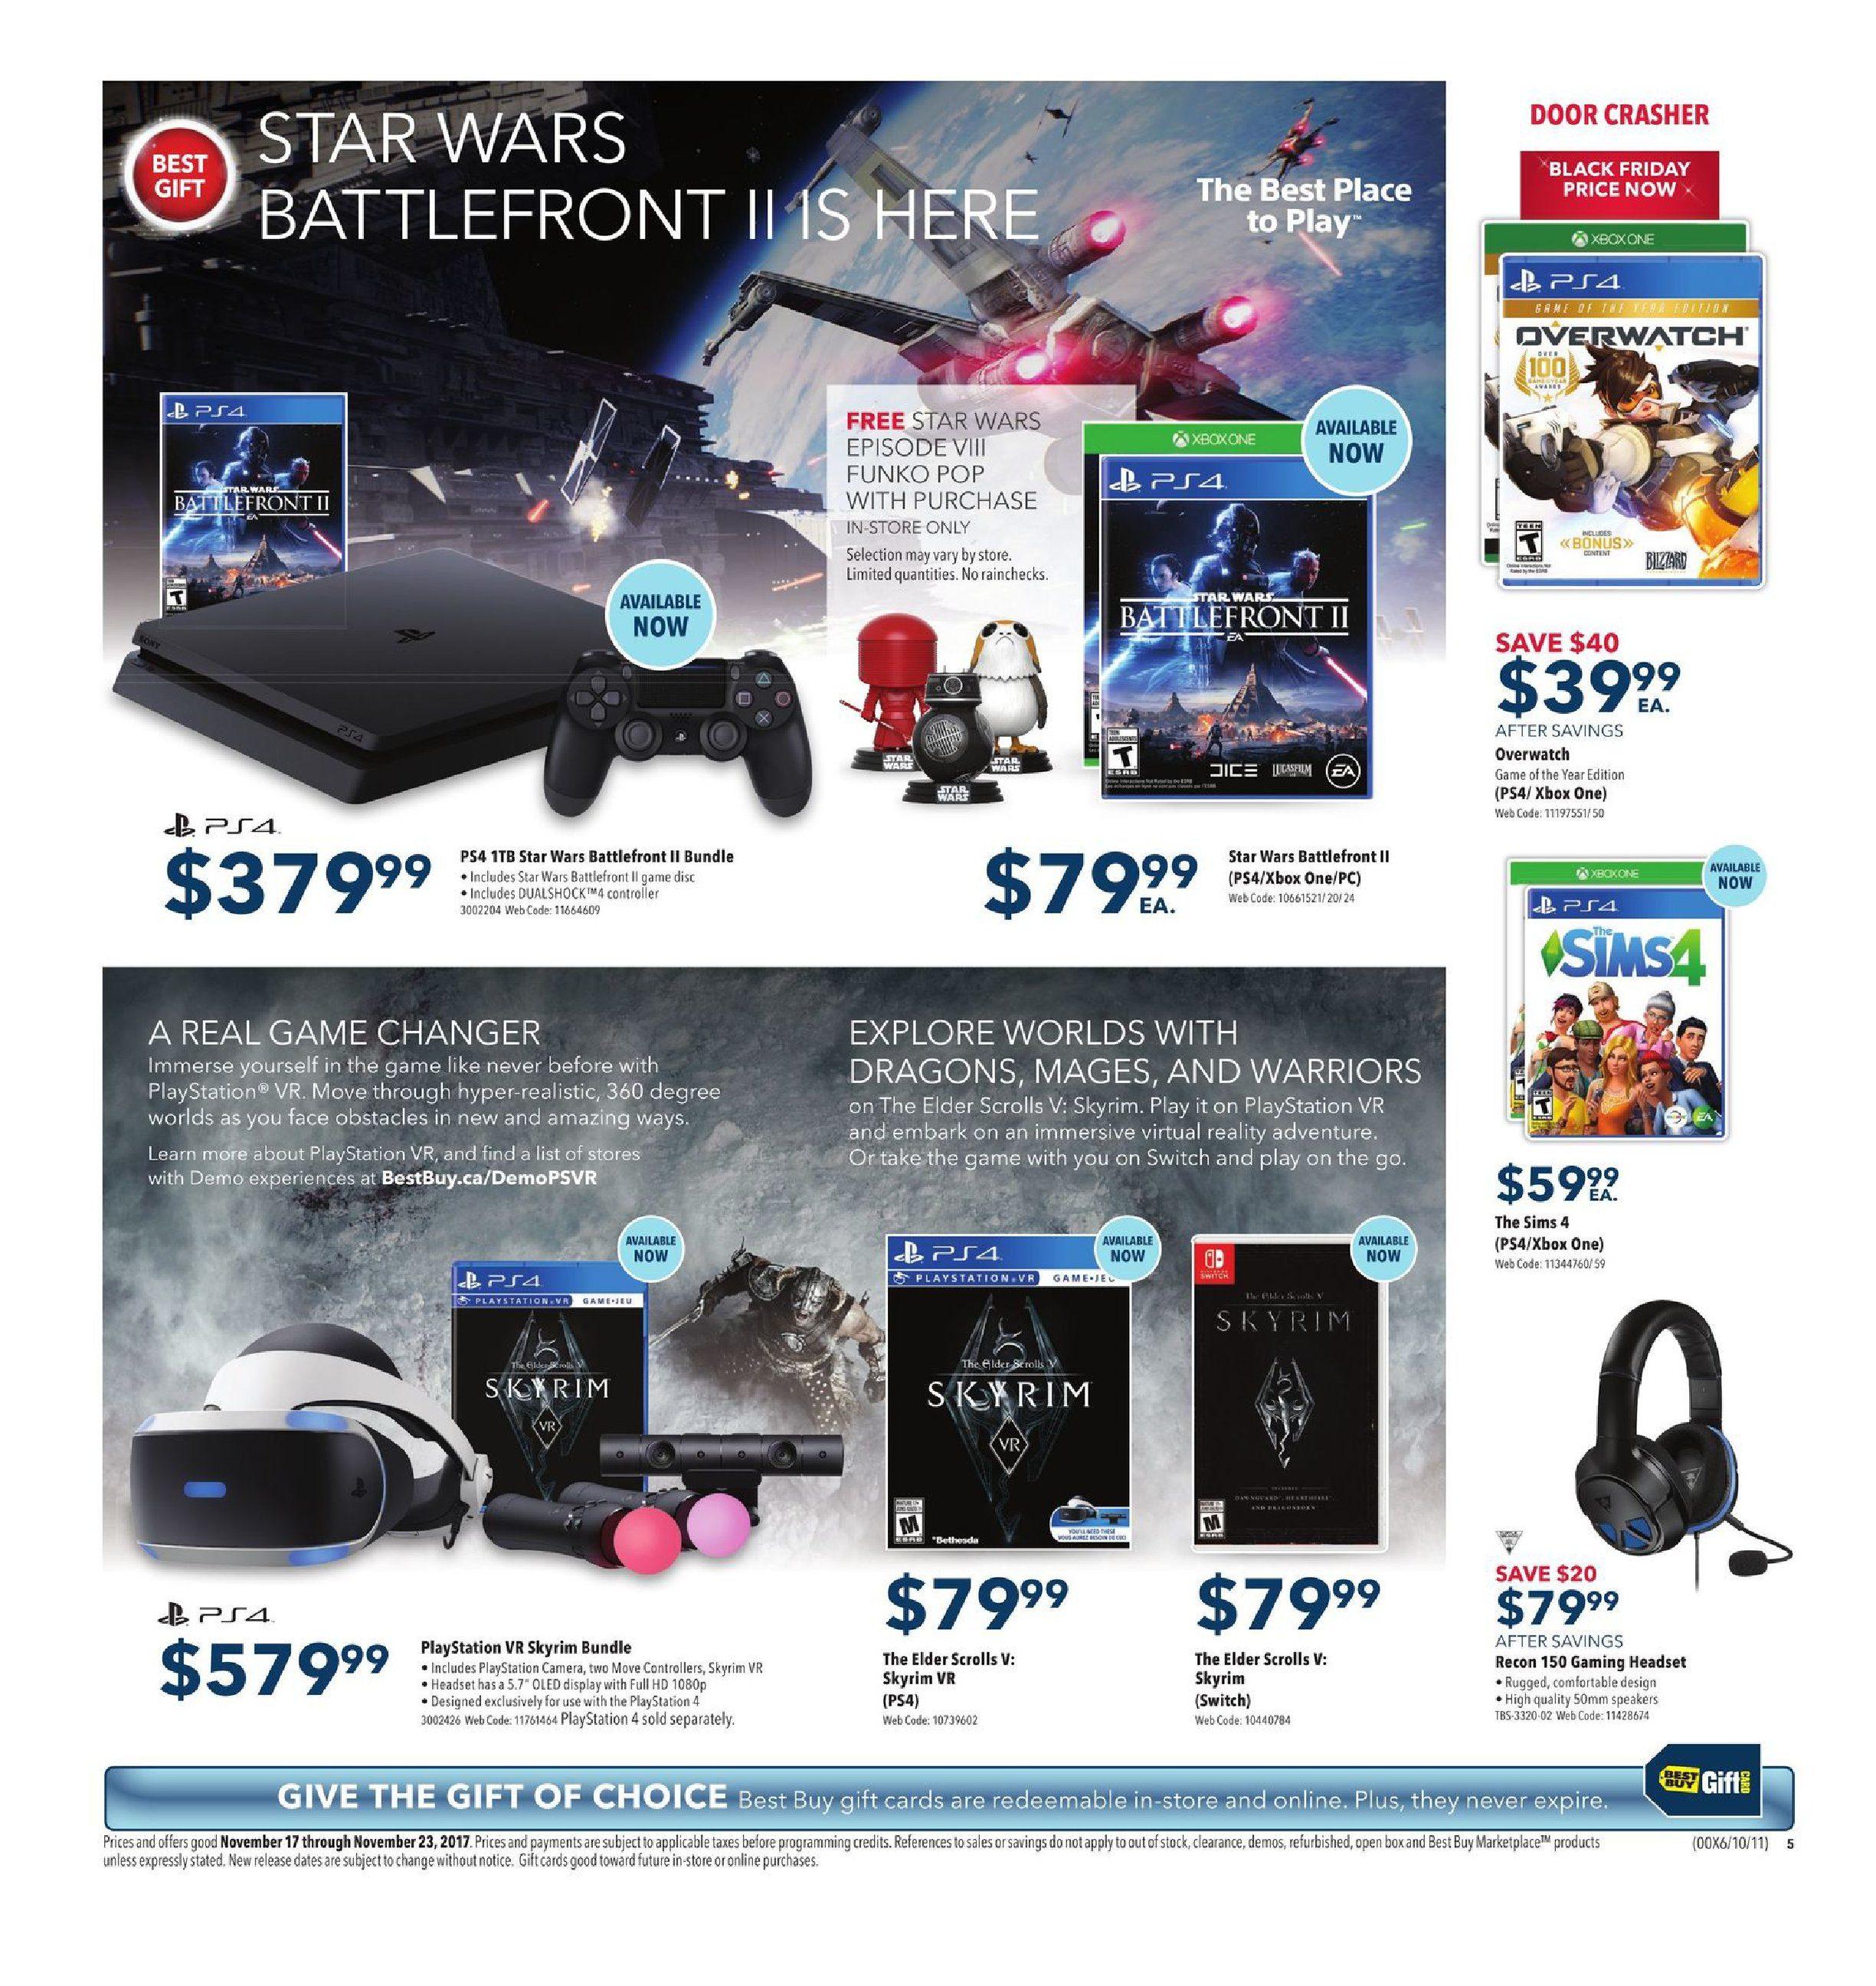 Best Buy Weekly Flyer Black Friday Prices Now Nov 17 Mdisk Headset Super Boom J278 23